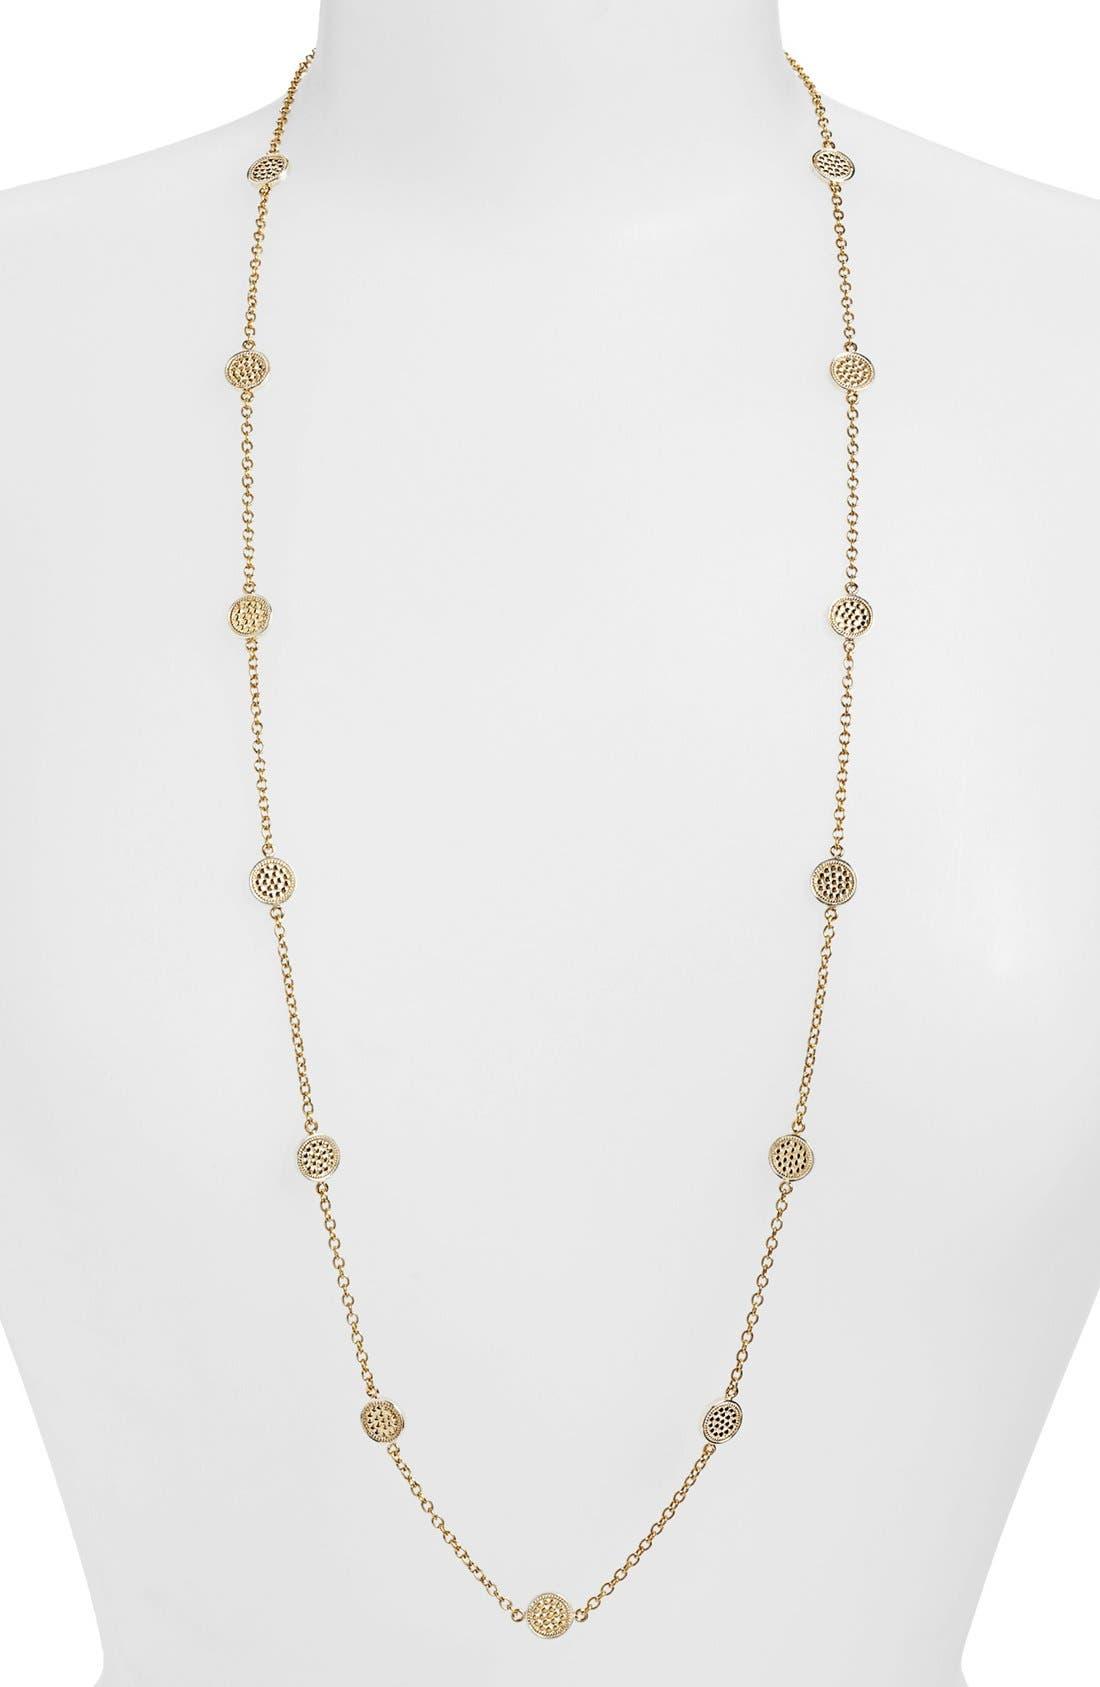 Main Image - Anna Beck 'Gili' Mini Disc Long Necklace